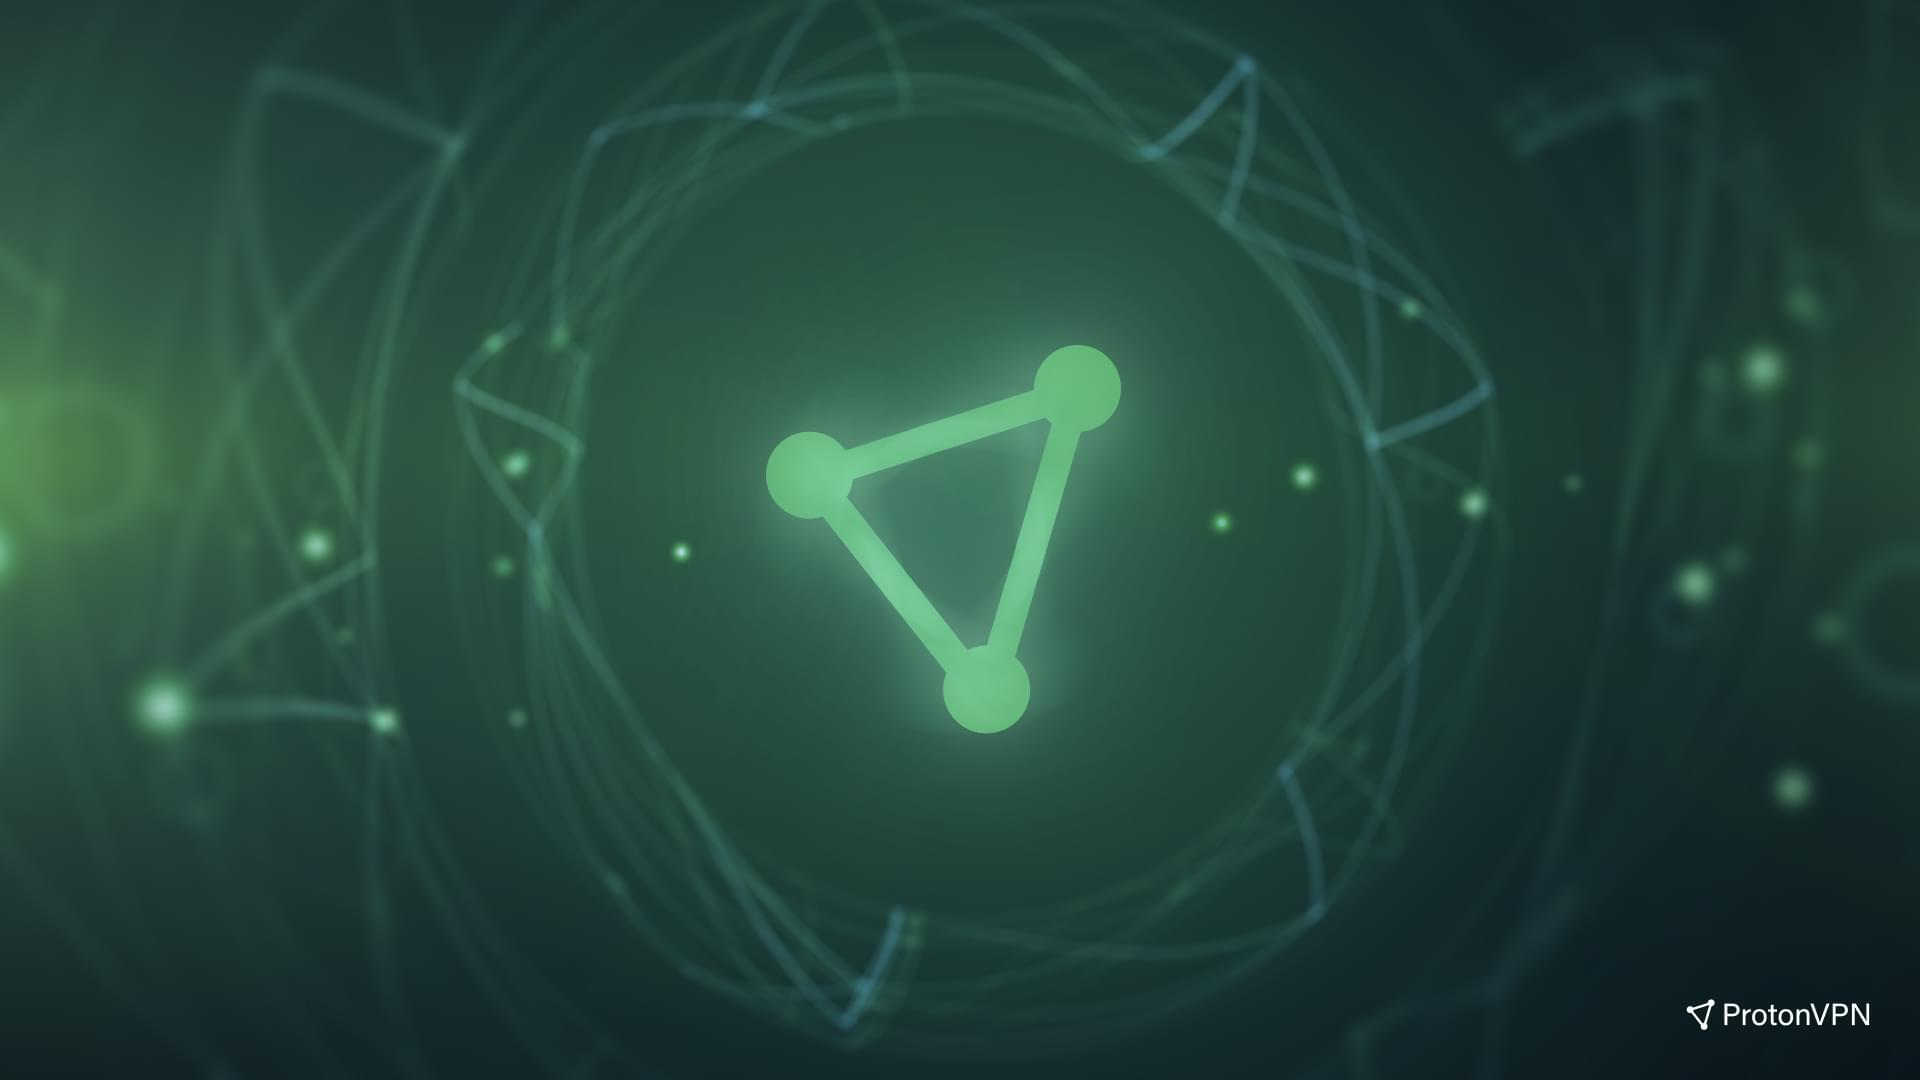 ProtonVPN Free UPDATED VPN Service Lets You Encrypt Your Connection maPZNx4i2cezZnM9pNBSXd